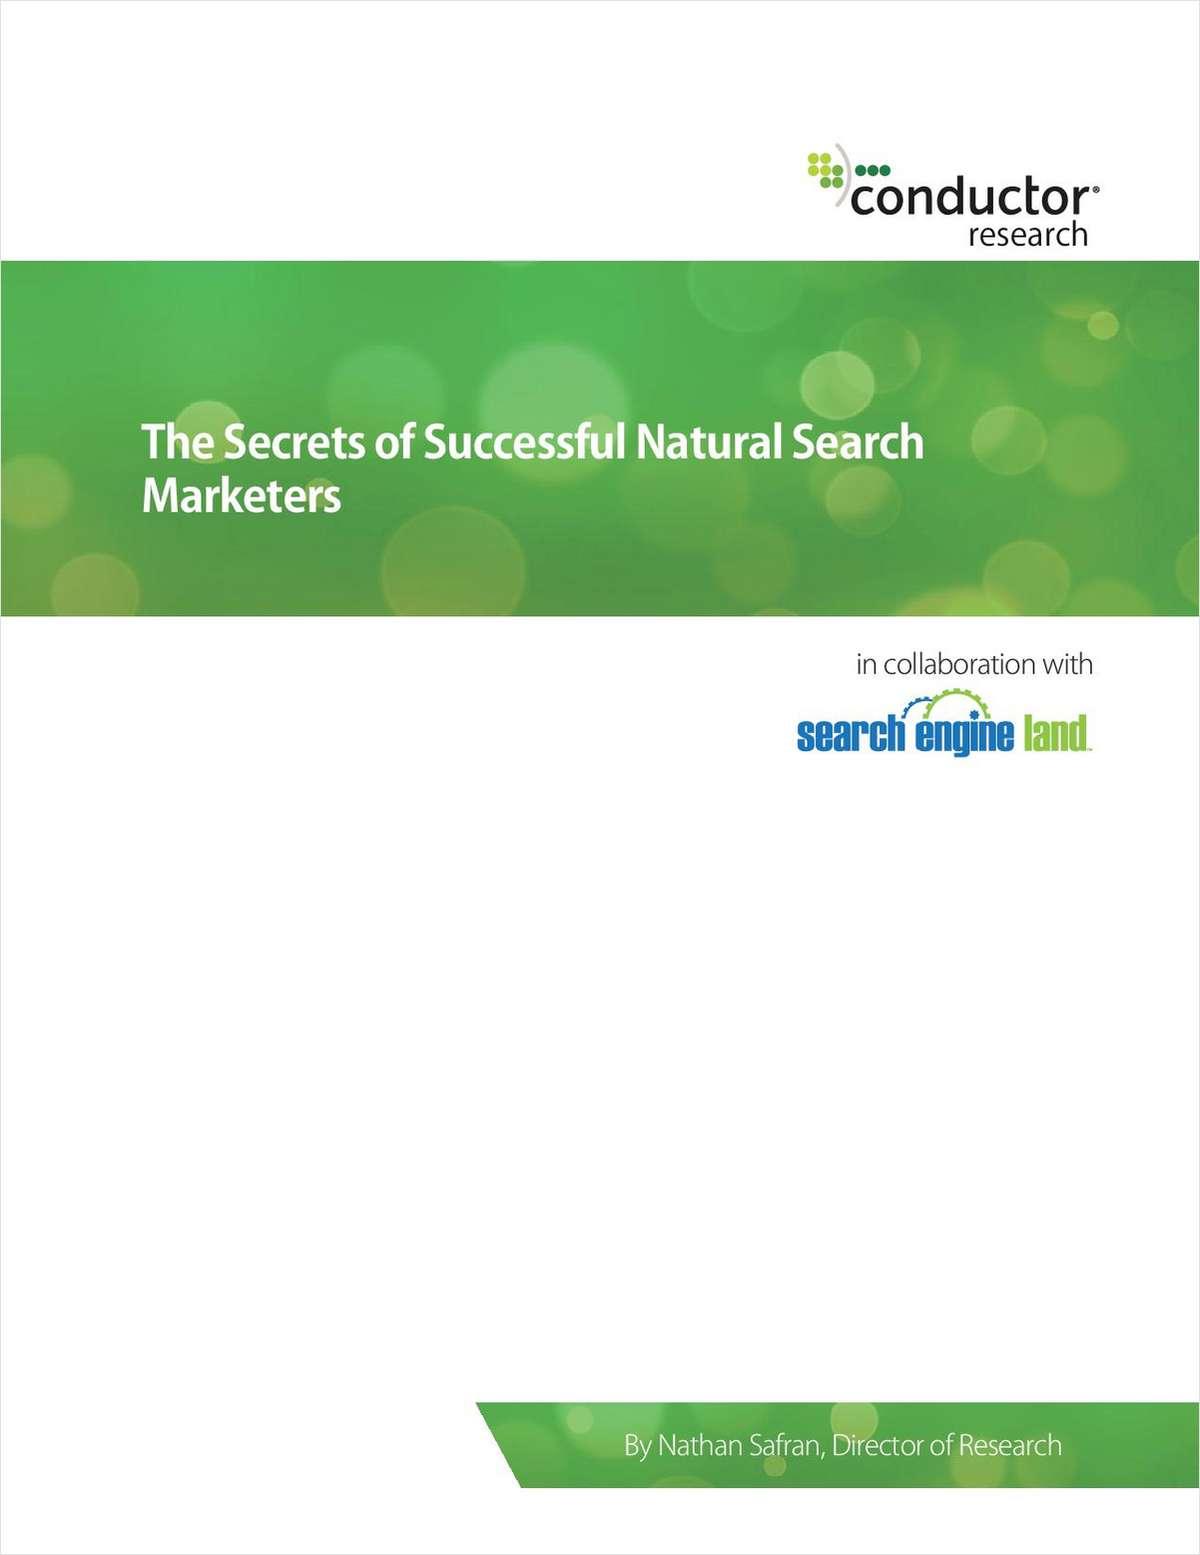 Secrets of Successful Search Marketers